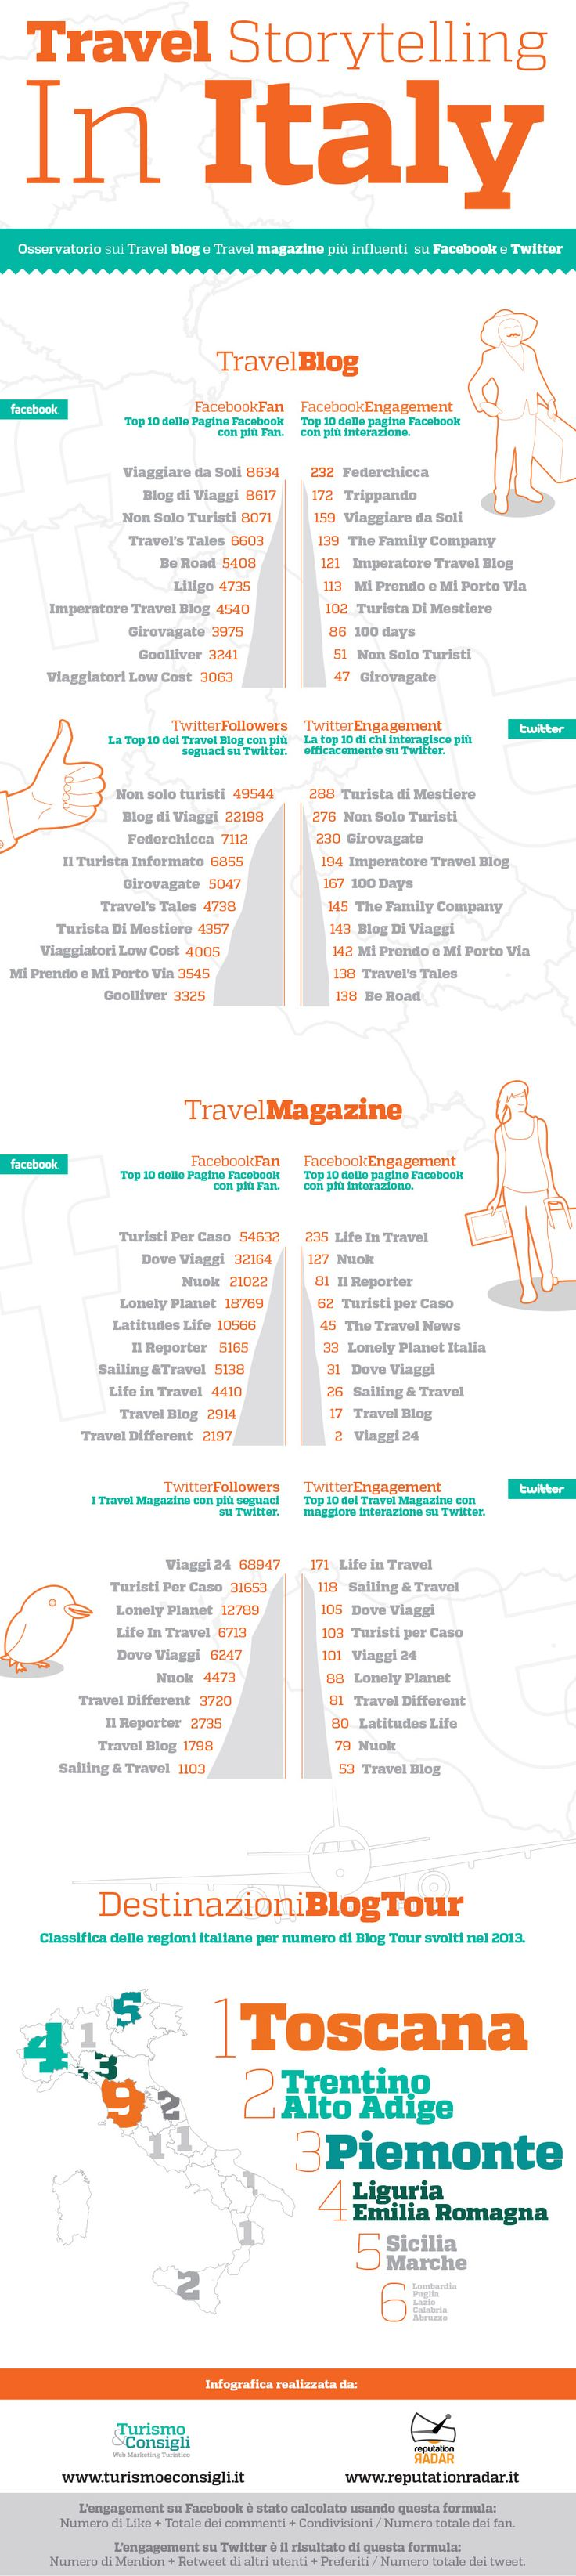 Travel Storytelling in Italy, l'infografica sui blog e magazine più social